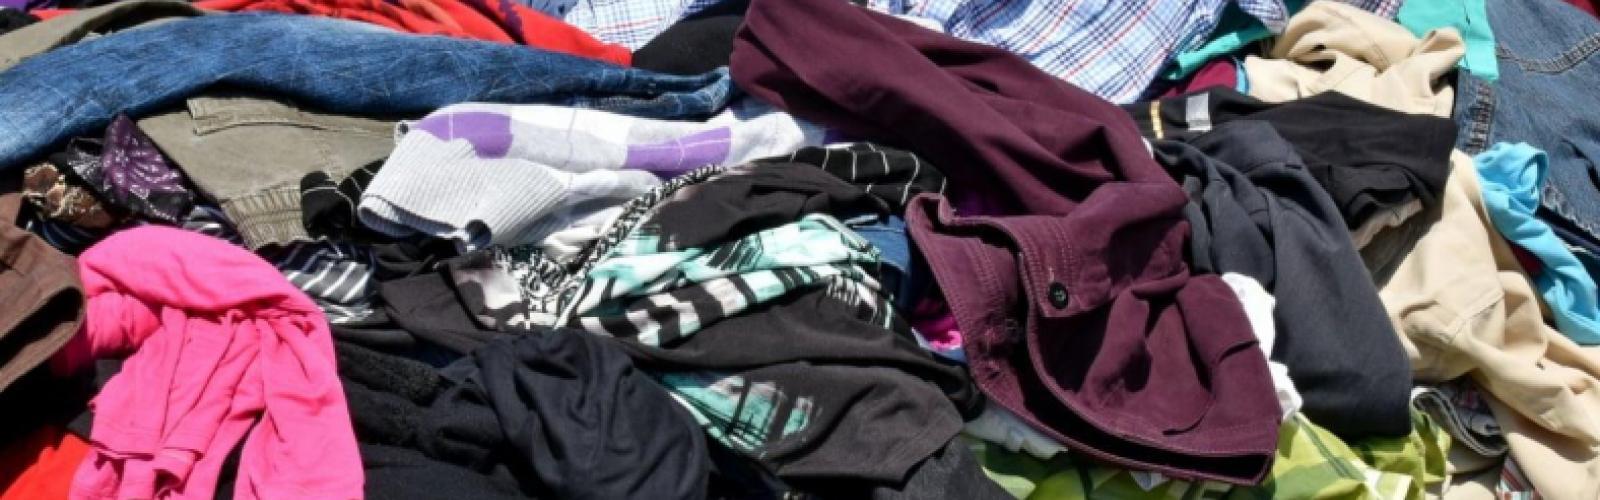 berg afgedankte kleding